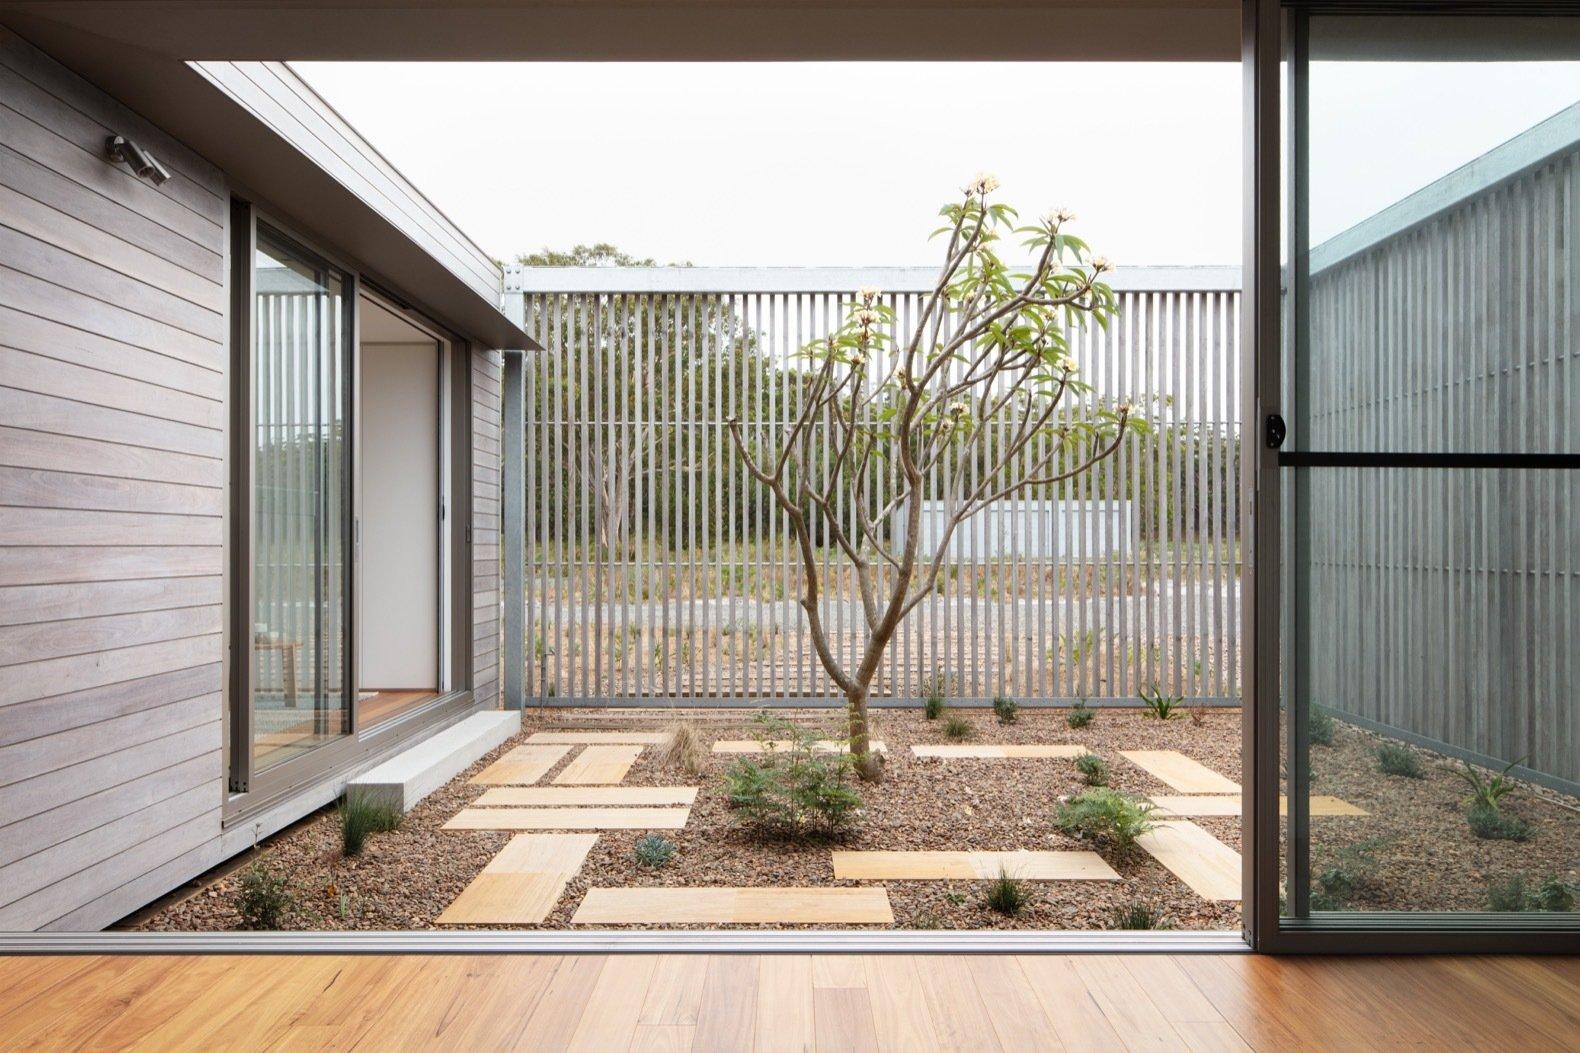 Courtyard of Courtyard House by CHROFI and FABPREFAB